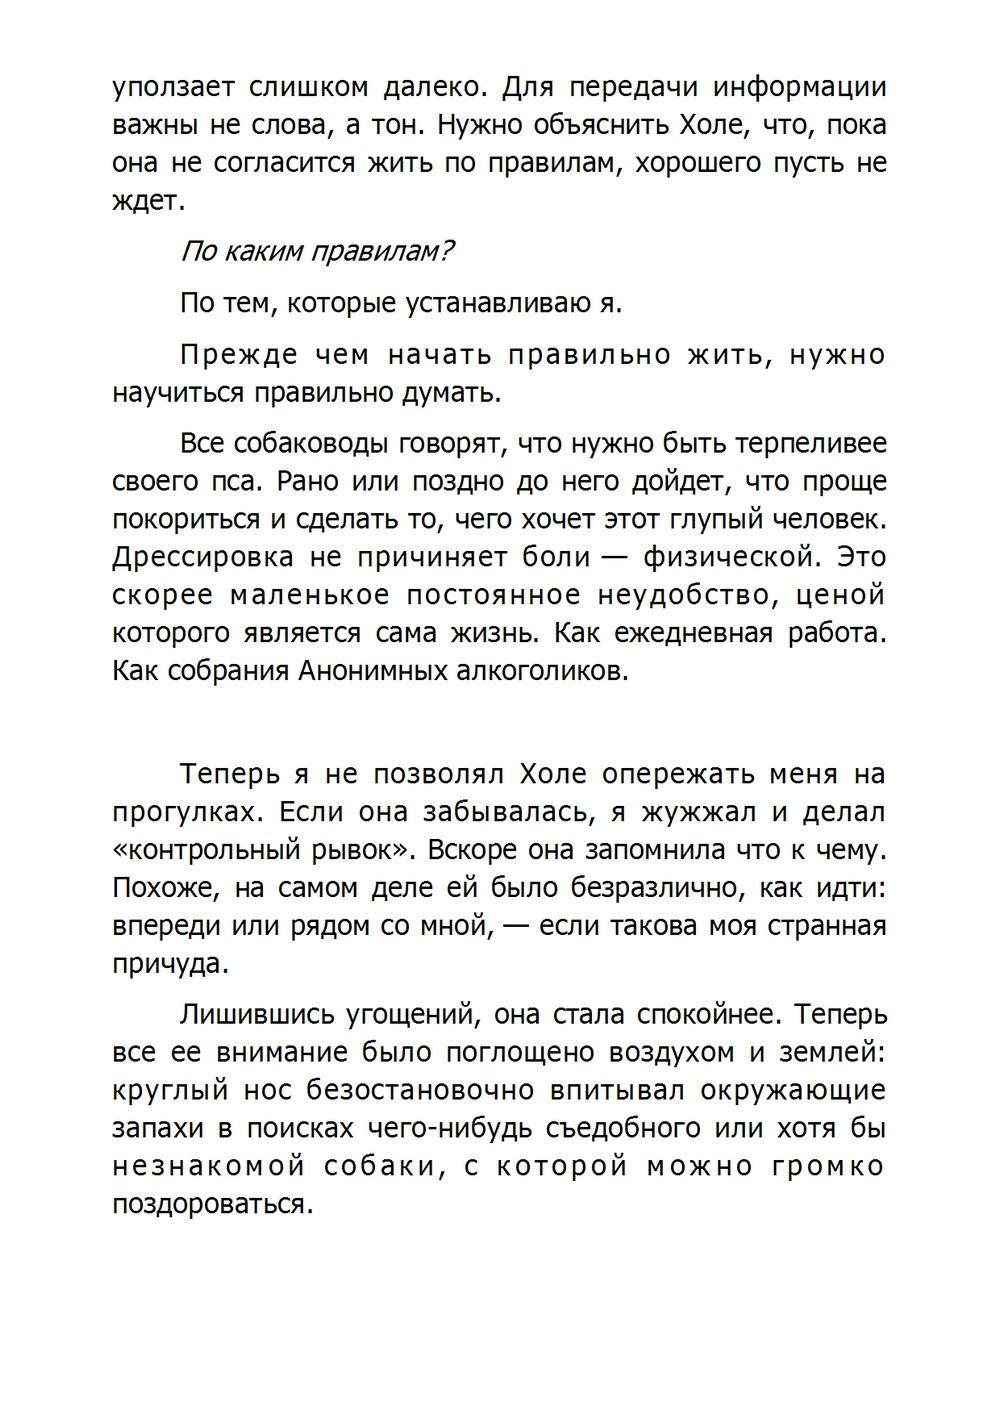 http://i6.imageban.ru/out/2013/11/19/8833c8519b7f021ef53ca30afe61864b.jpg